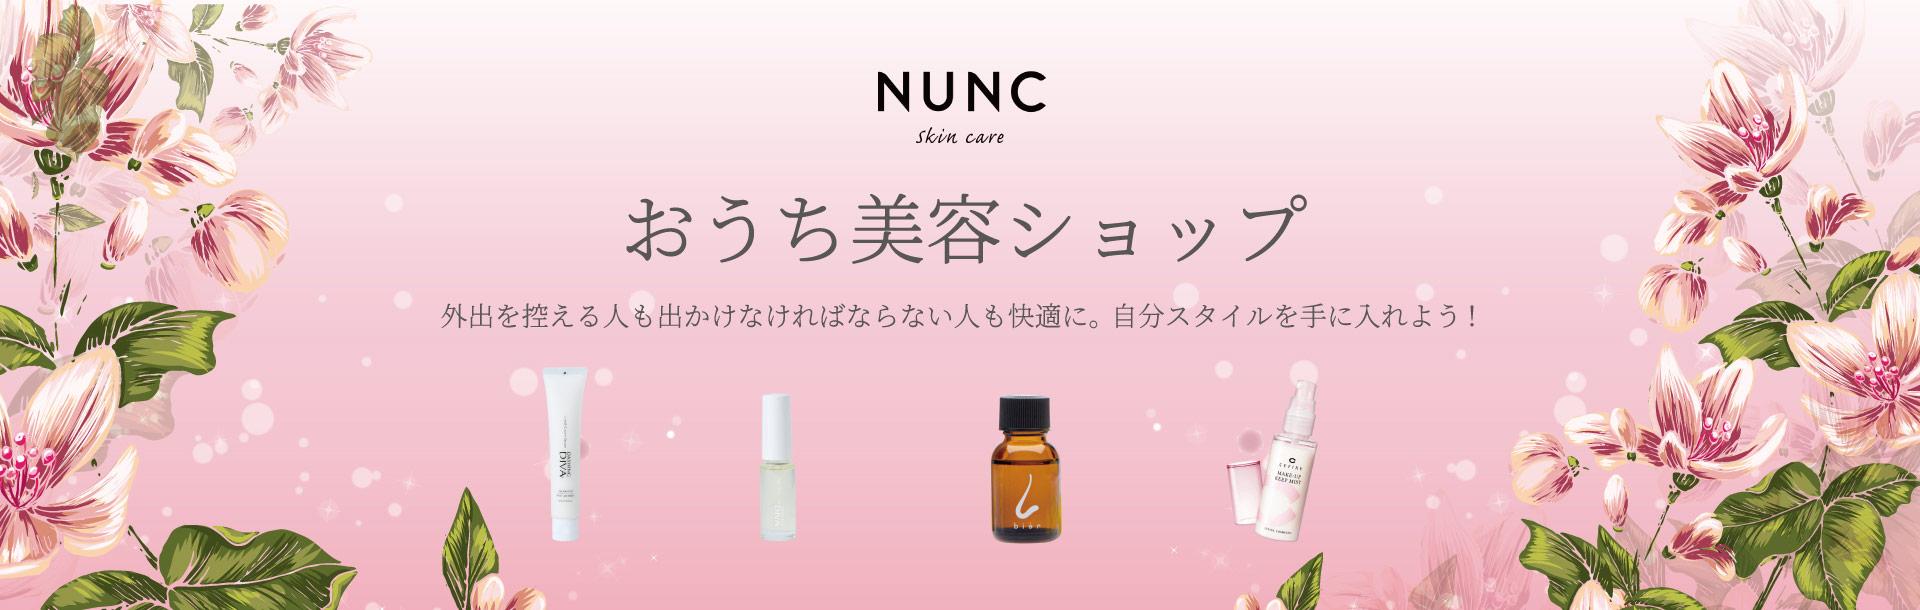 NUNCおうち美容ショップ